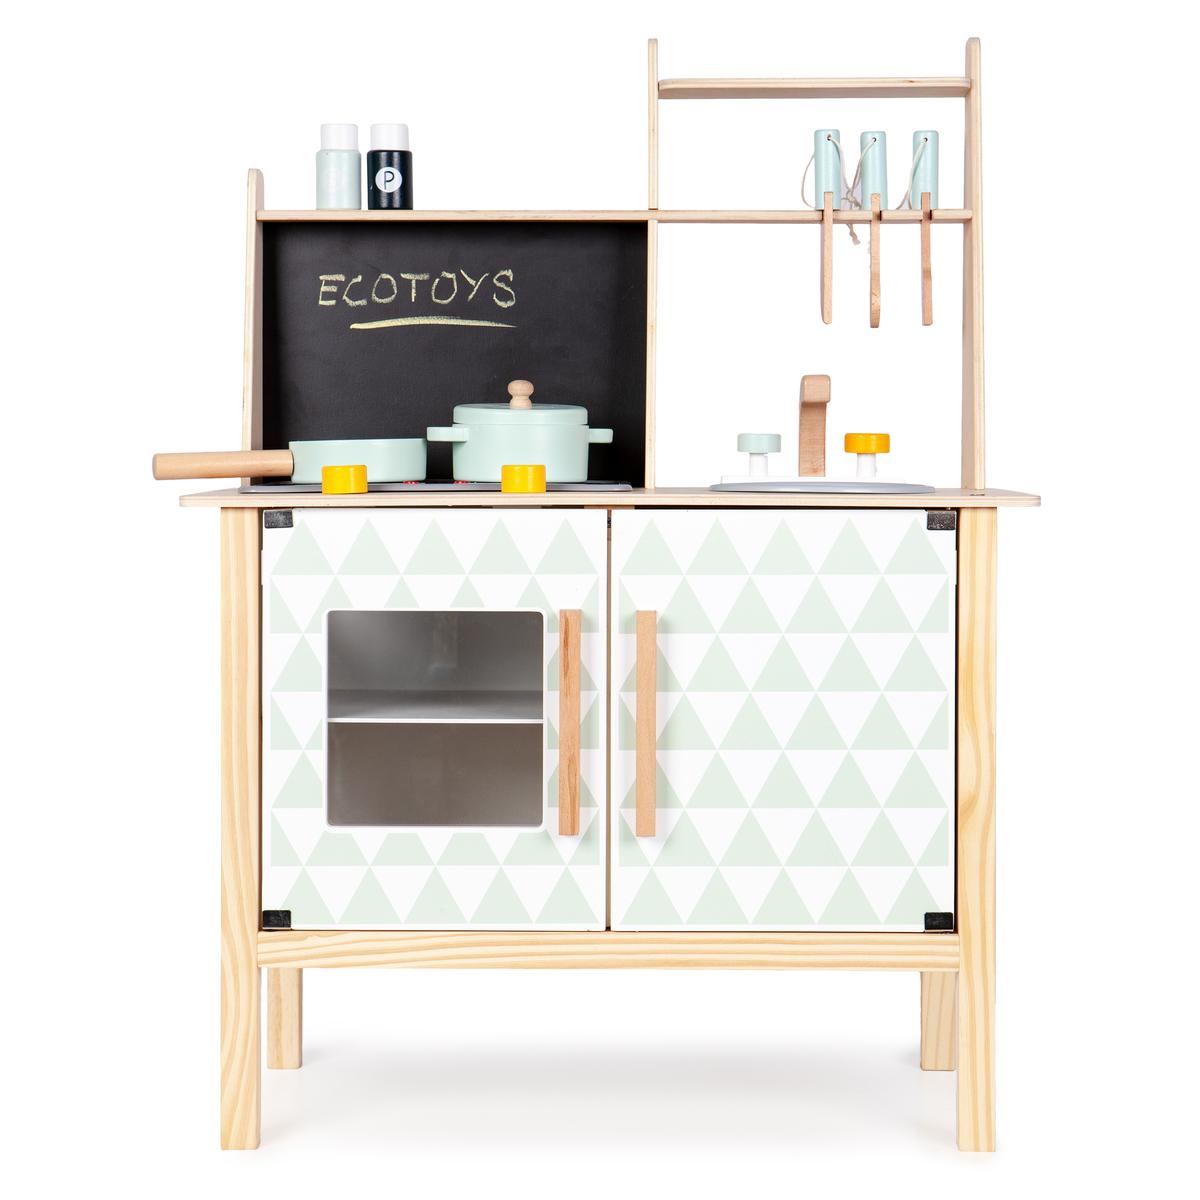 Drevená kuchynka Stella s vybavením wood kitchen